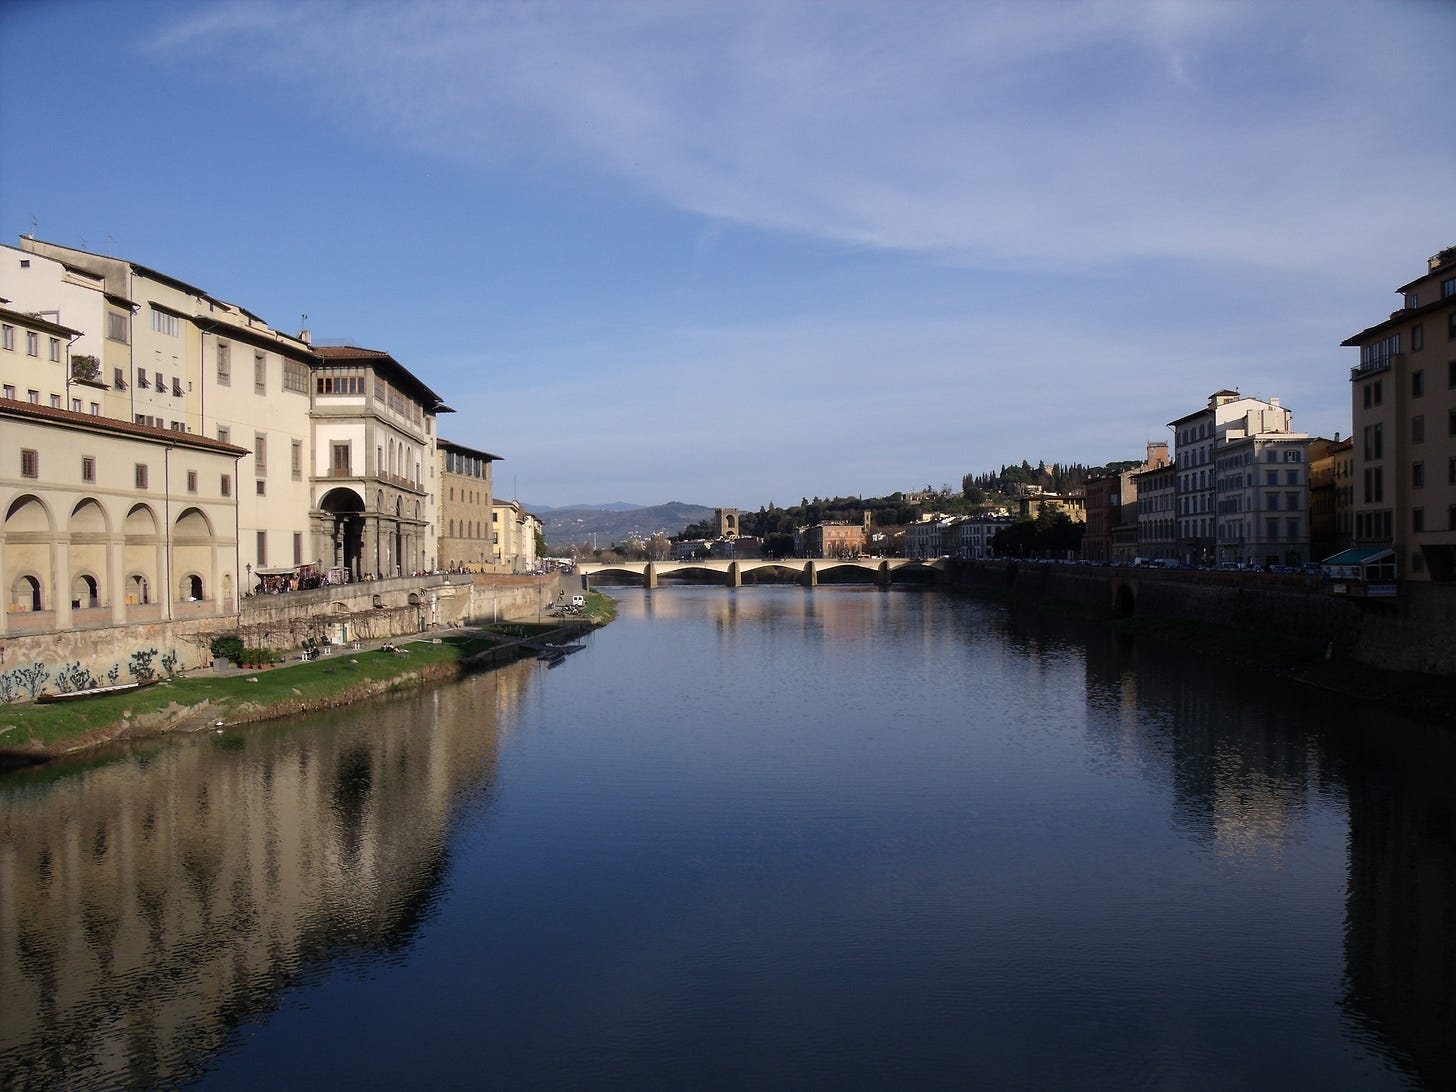 Arno - Wikipedia